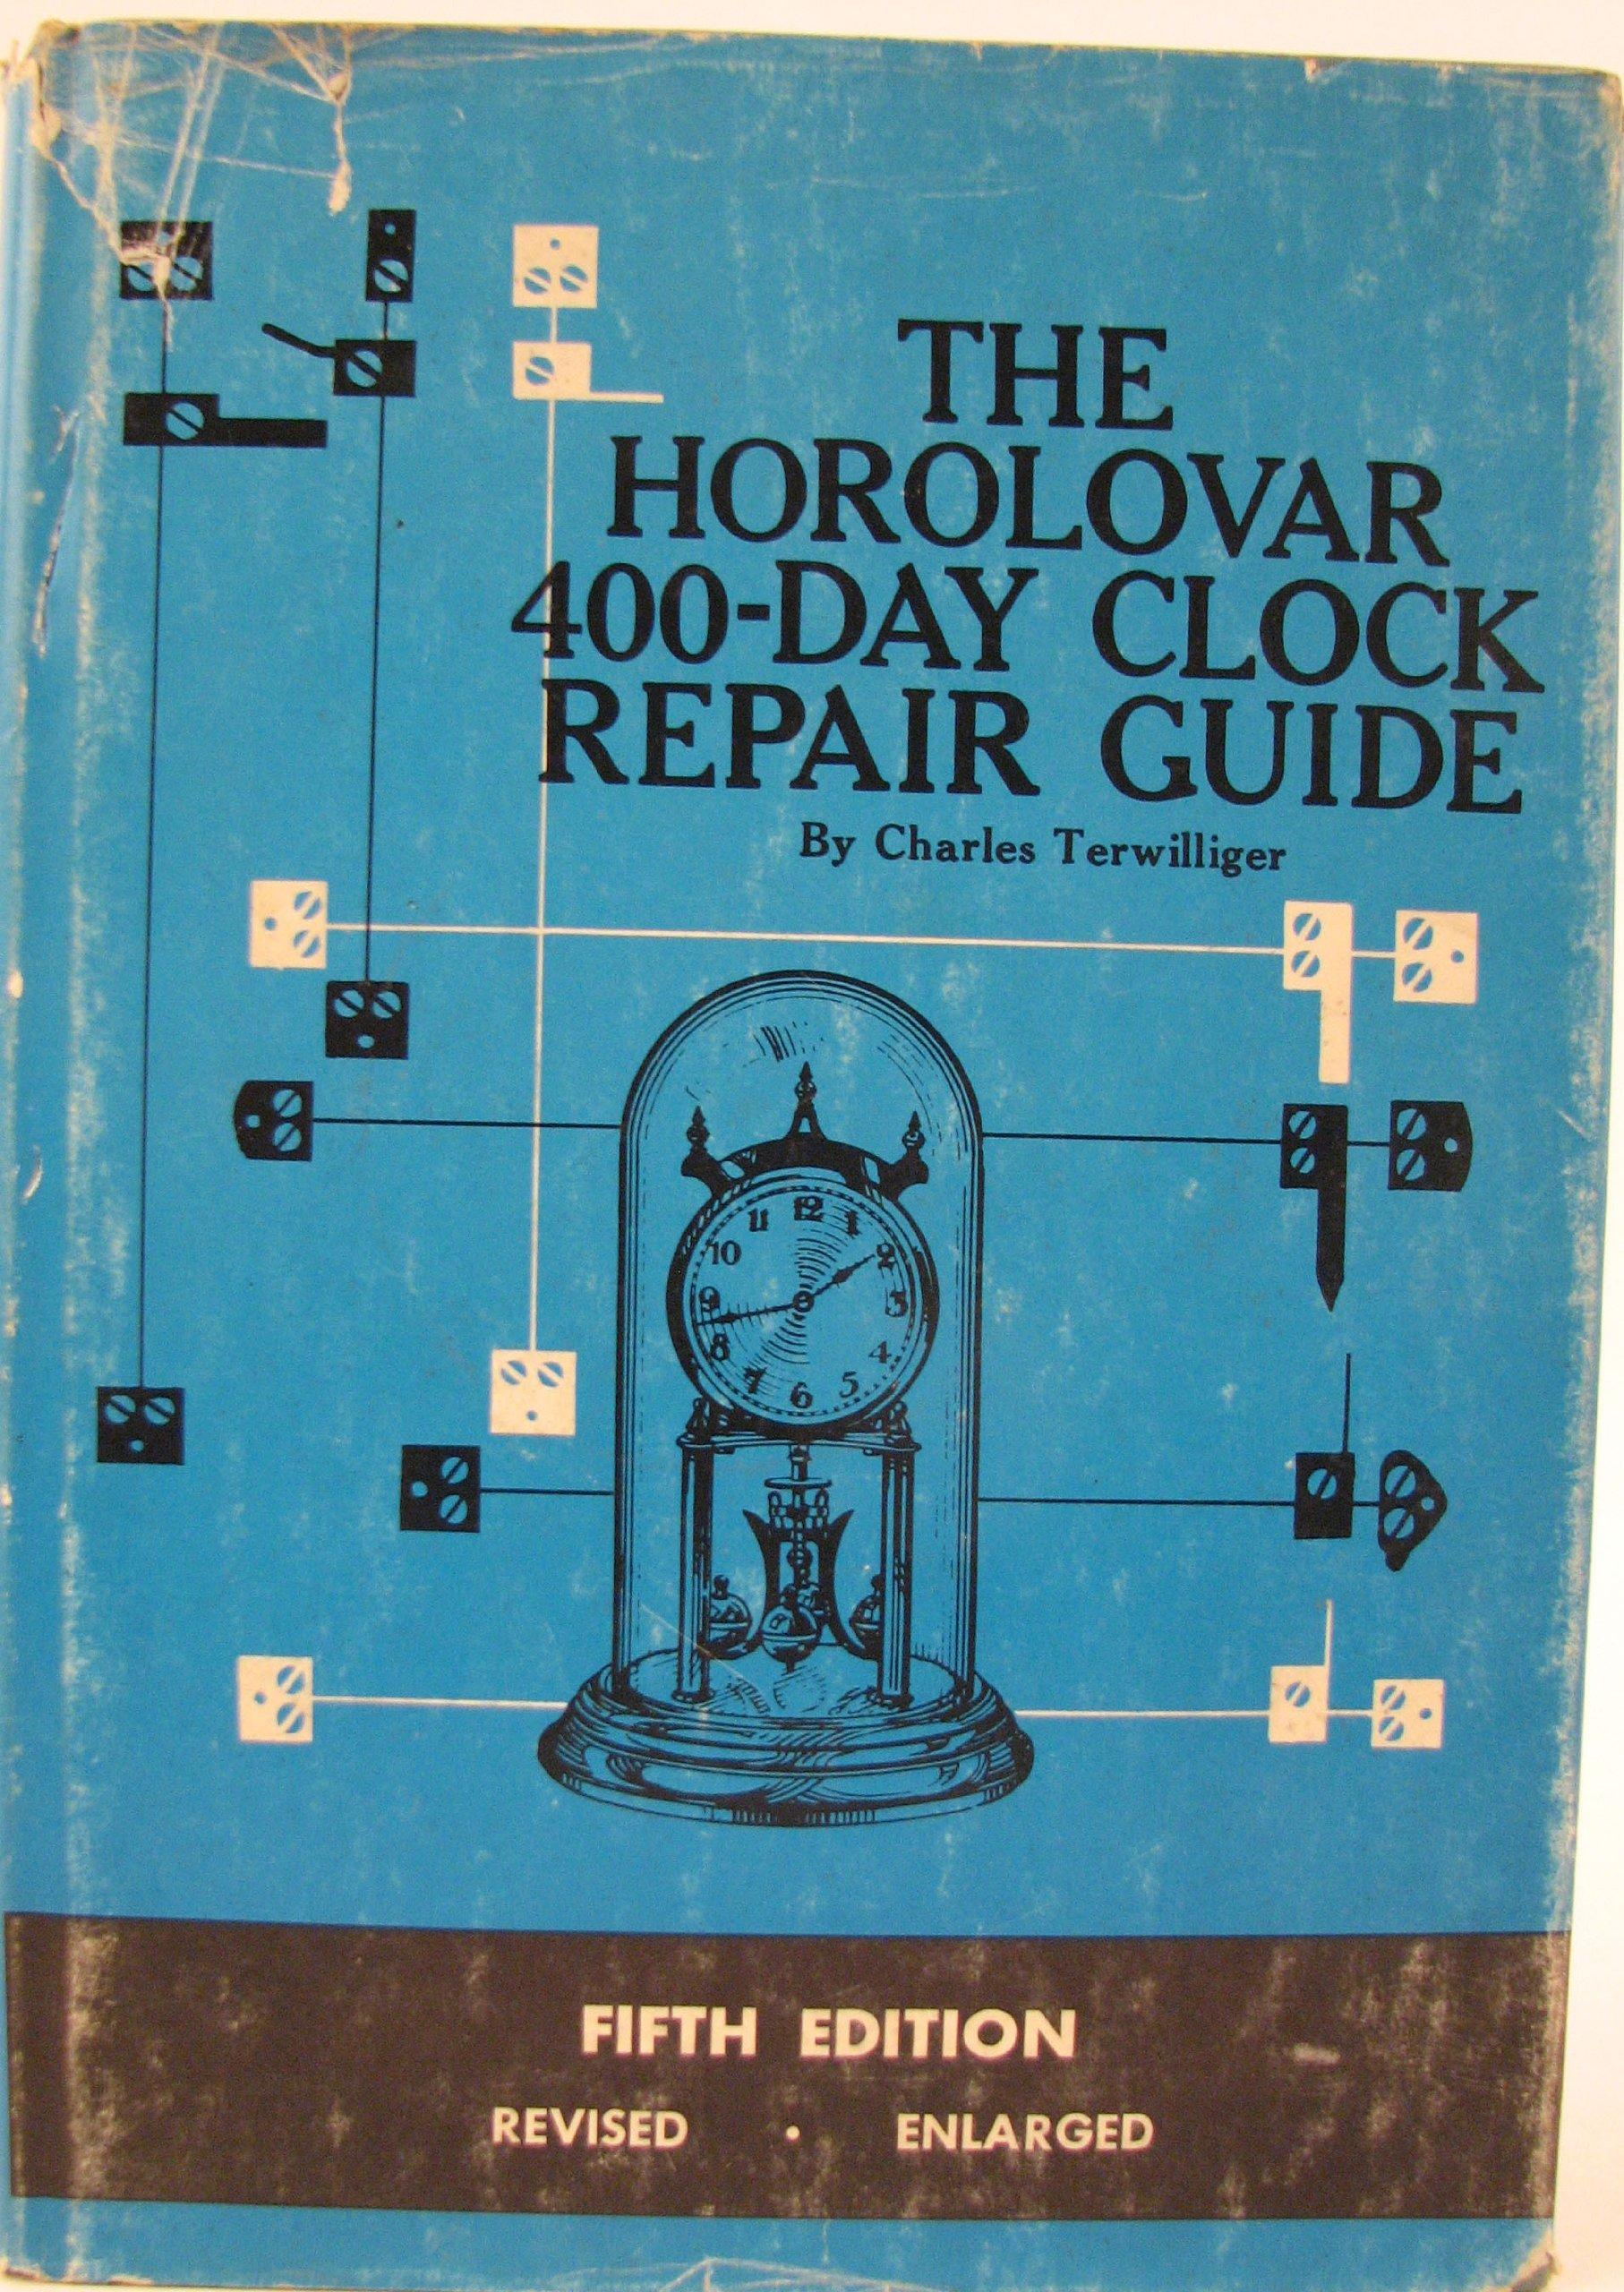 The Horolovar 400-day clock repair guide: Charles Terwillinger: Amazon.com:  Books